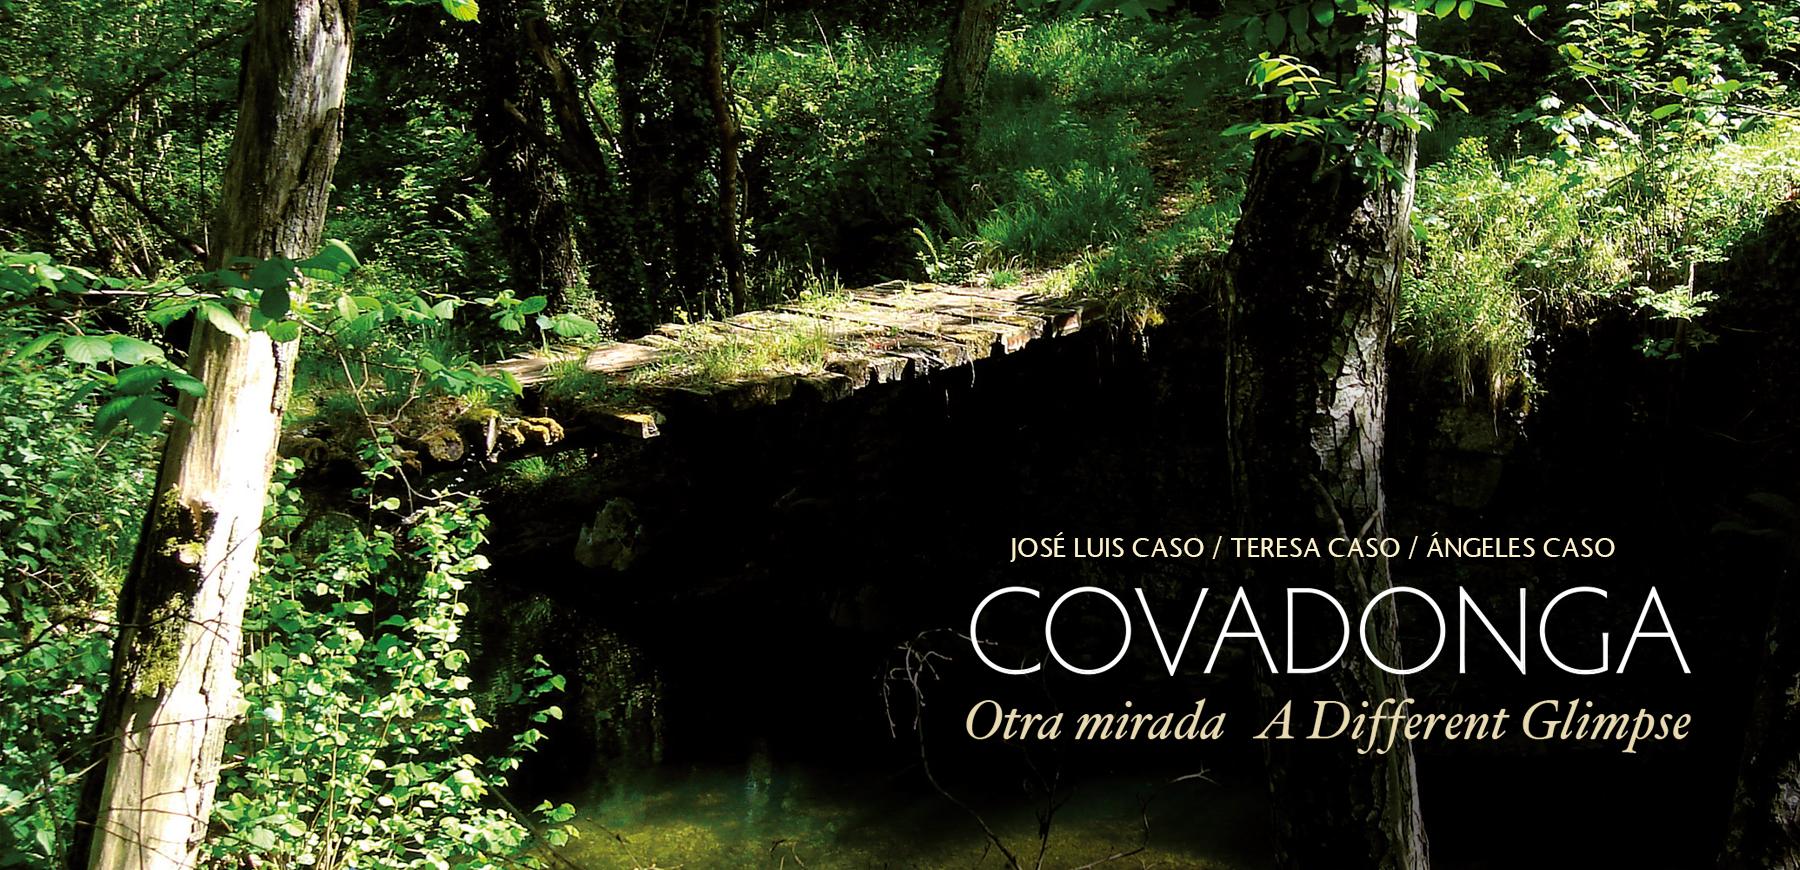 Covadonga-otra-mirada-1